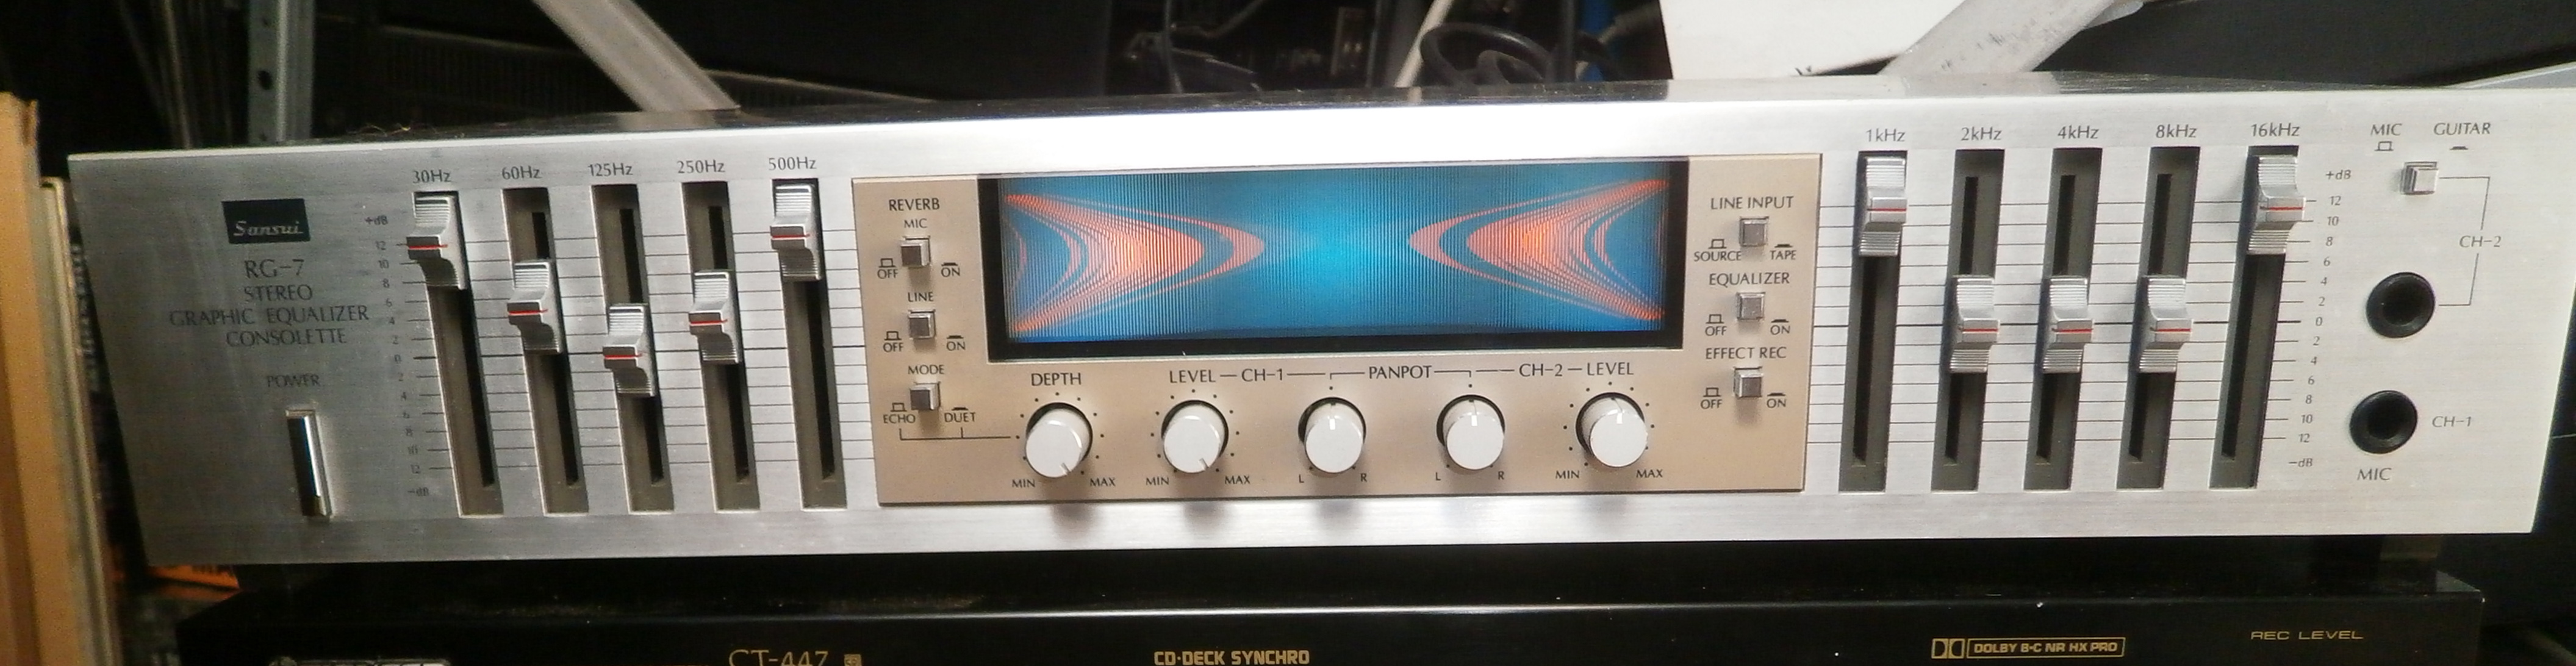 sansui rg 7 stereo graphic equalzier consolette image 1550808 rh en audiofanzine com Digital Baby Grand Player Piano RG7 Coax